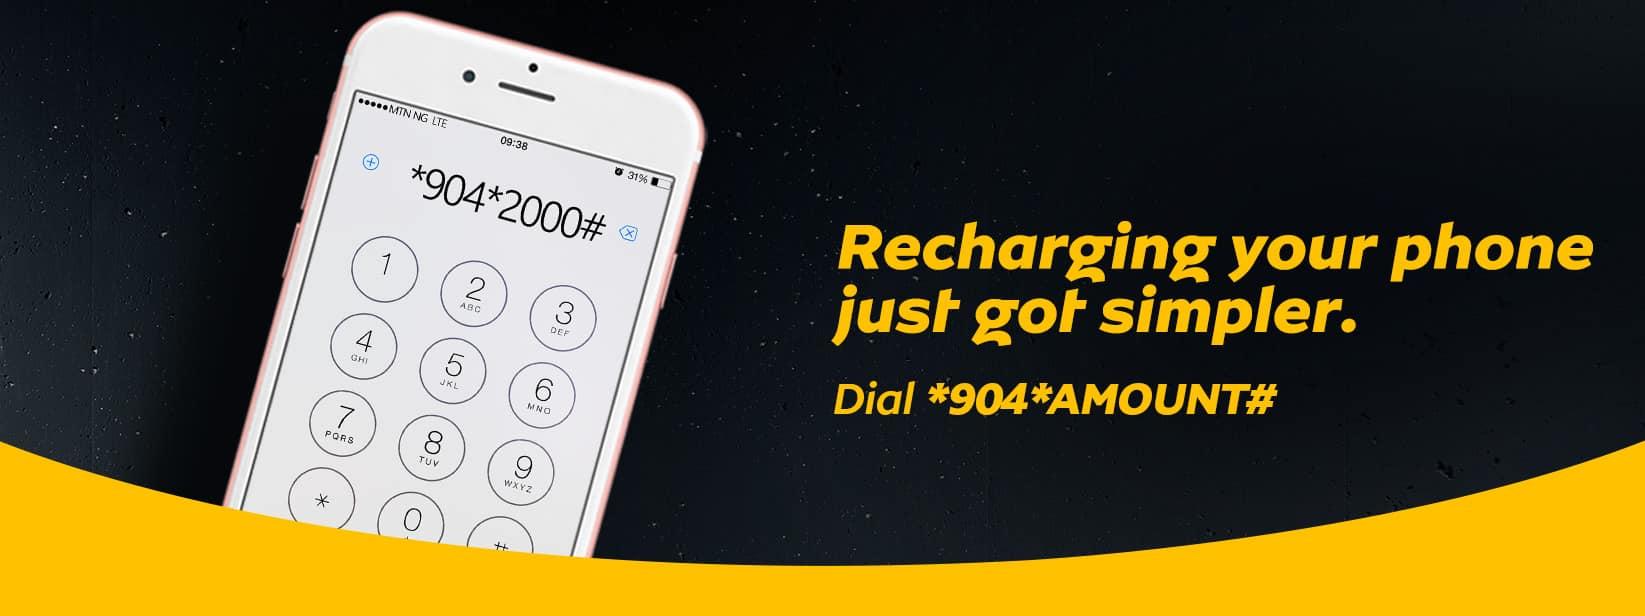 mtn 904 recharge